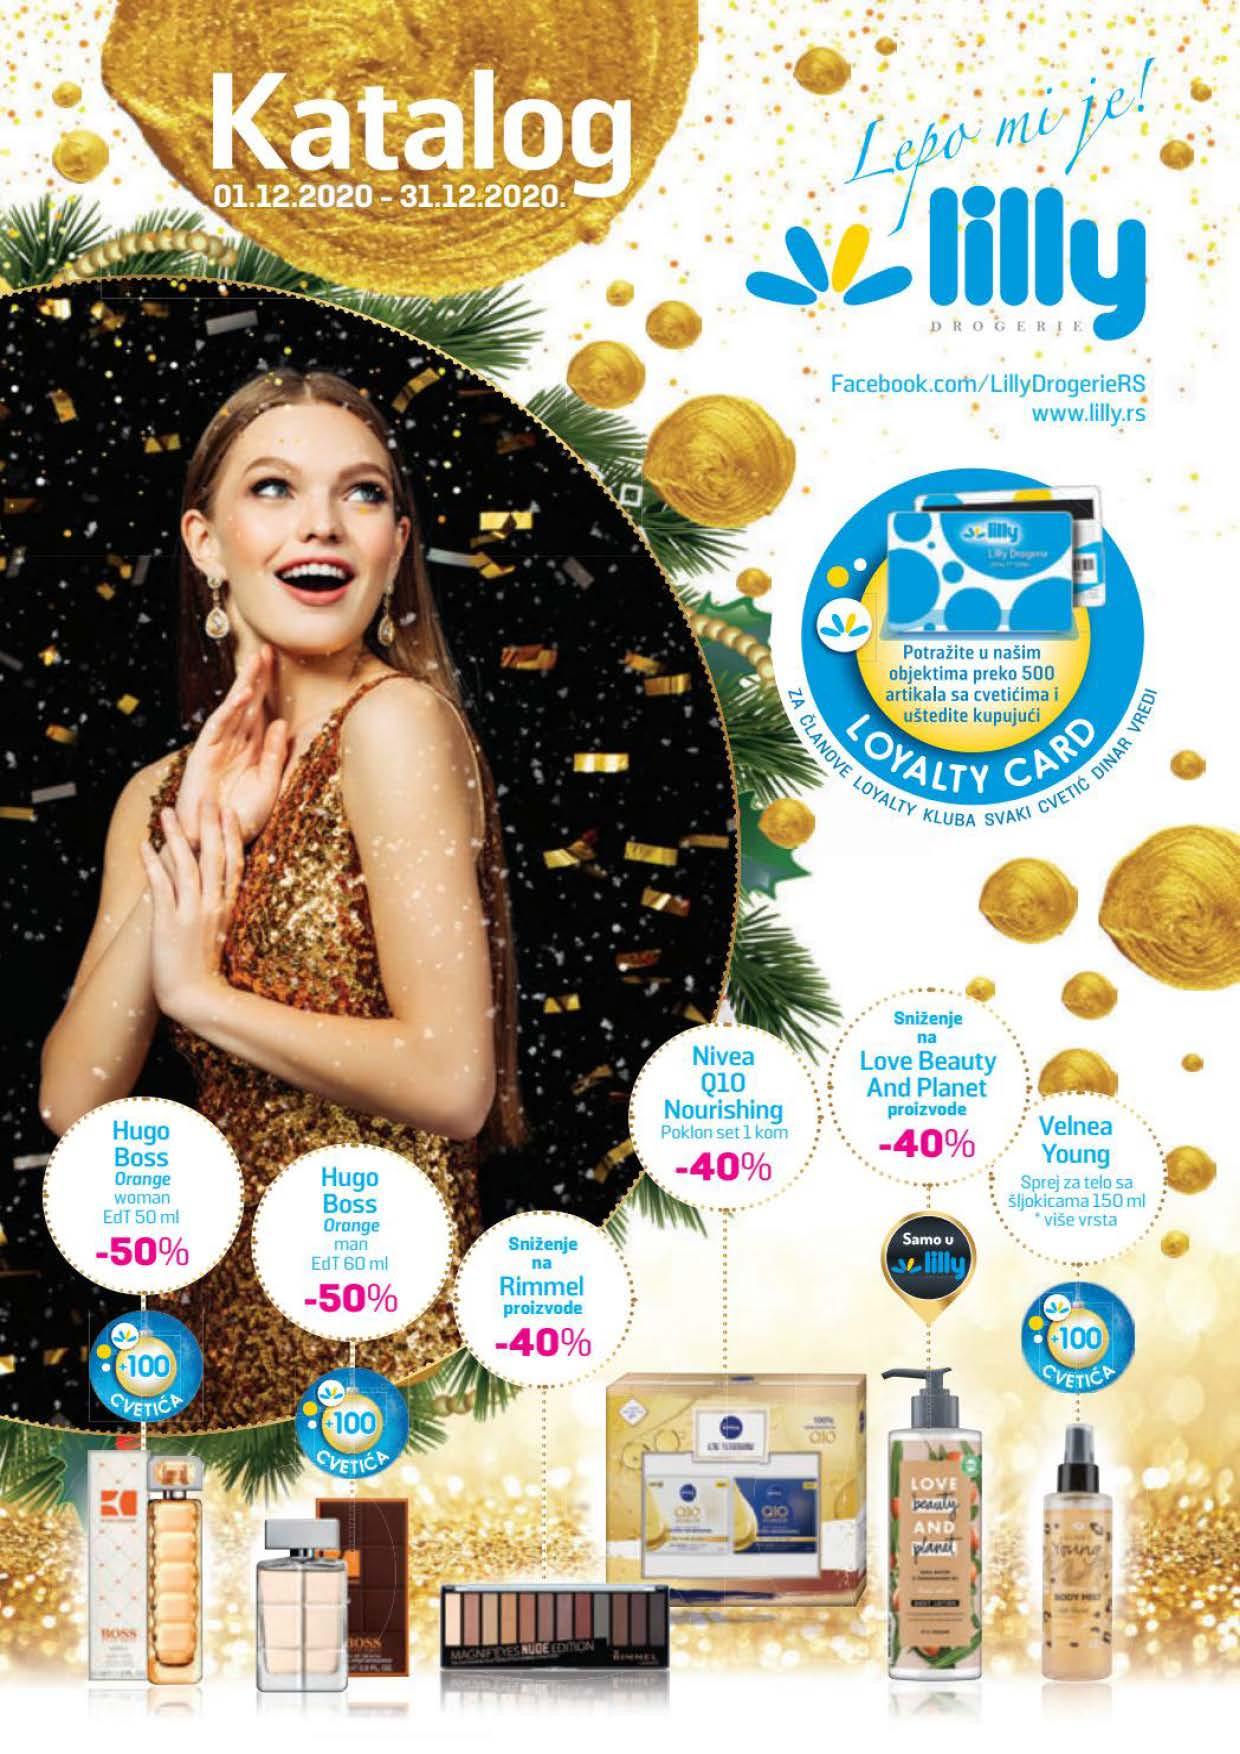 LILLY katalog LILLY ONLINE Akcija DECEMBAR 2020 01.12.2020. 31.12.2020. Page 01 1